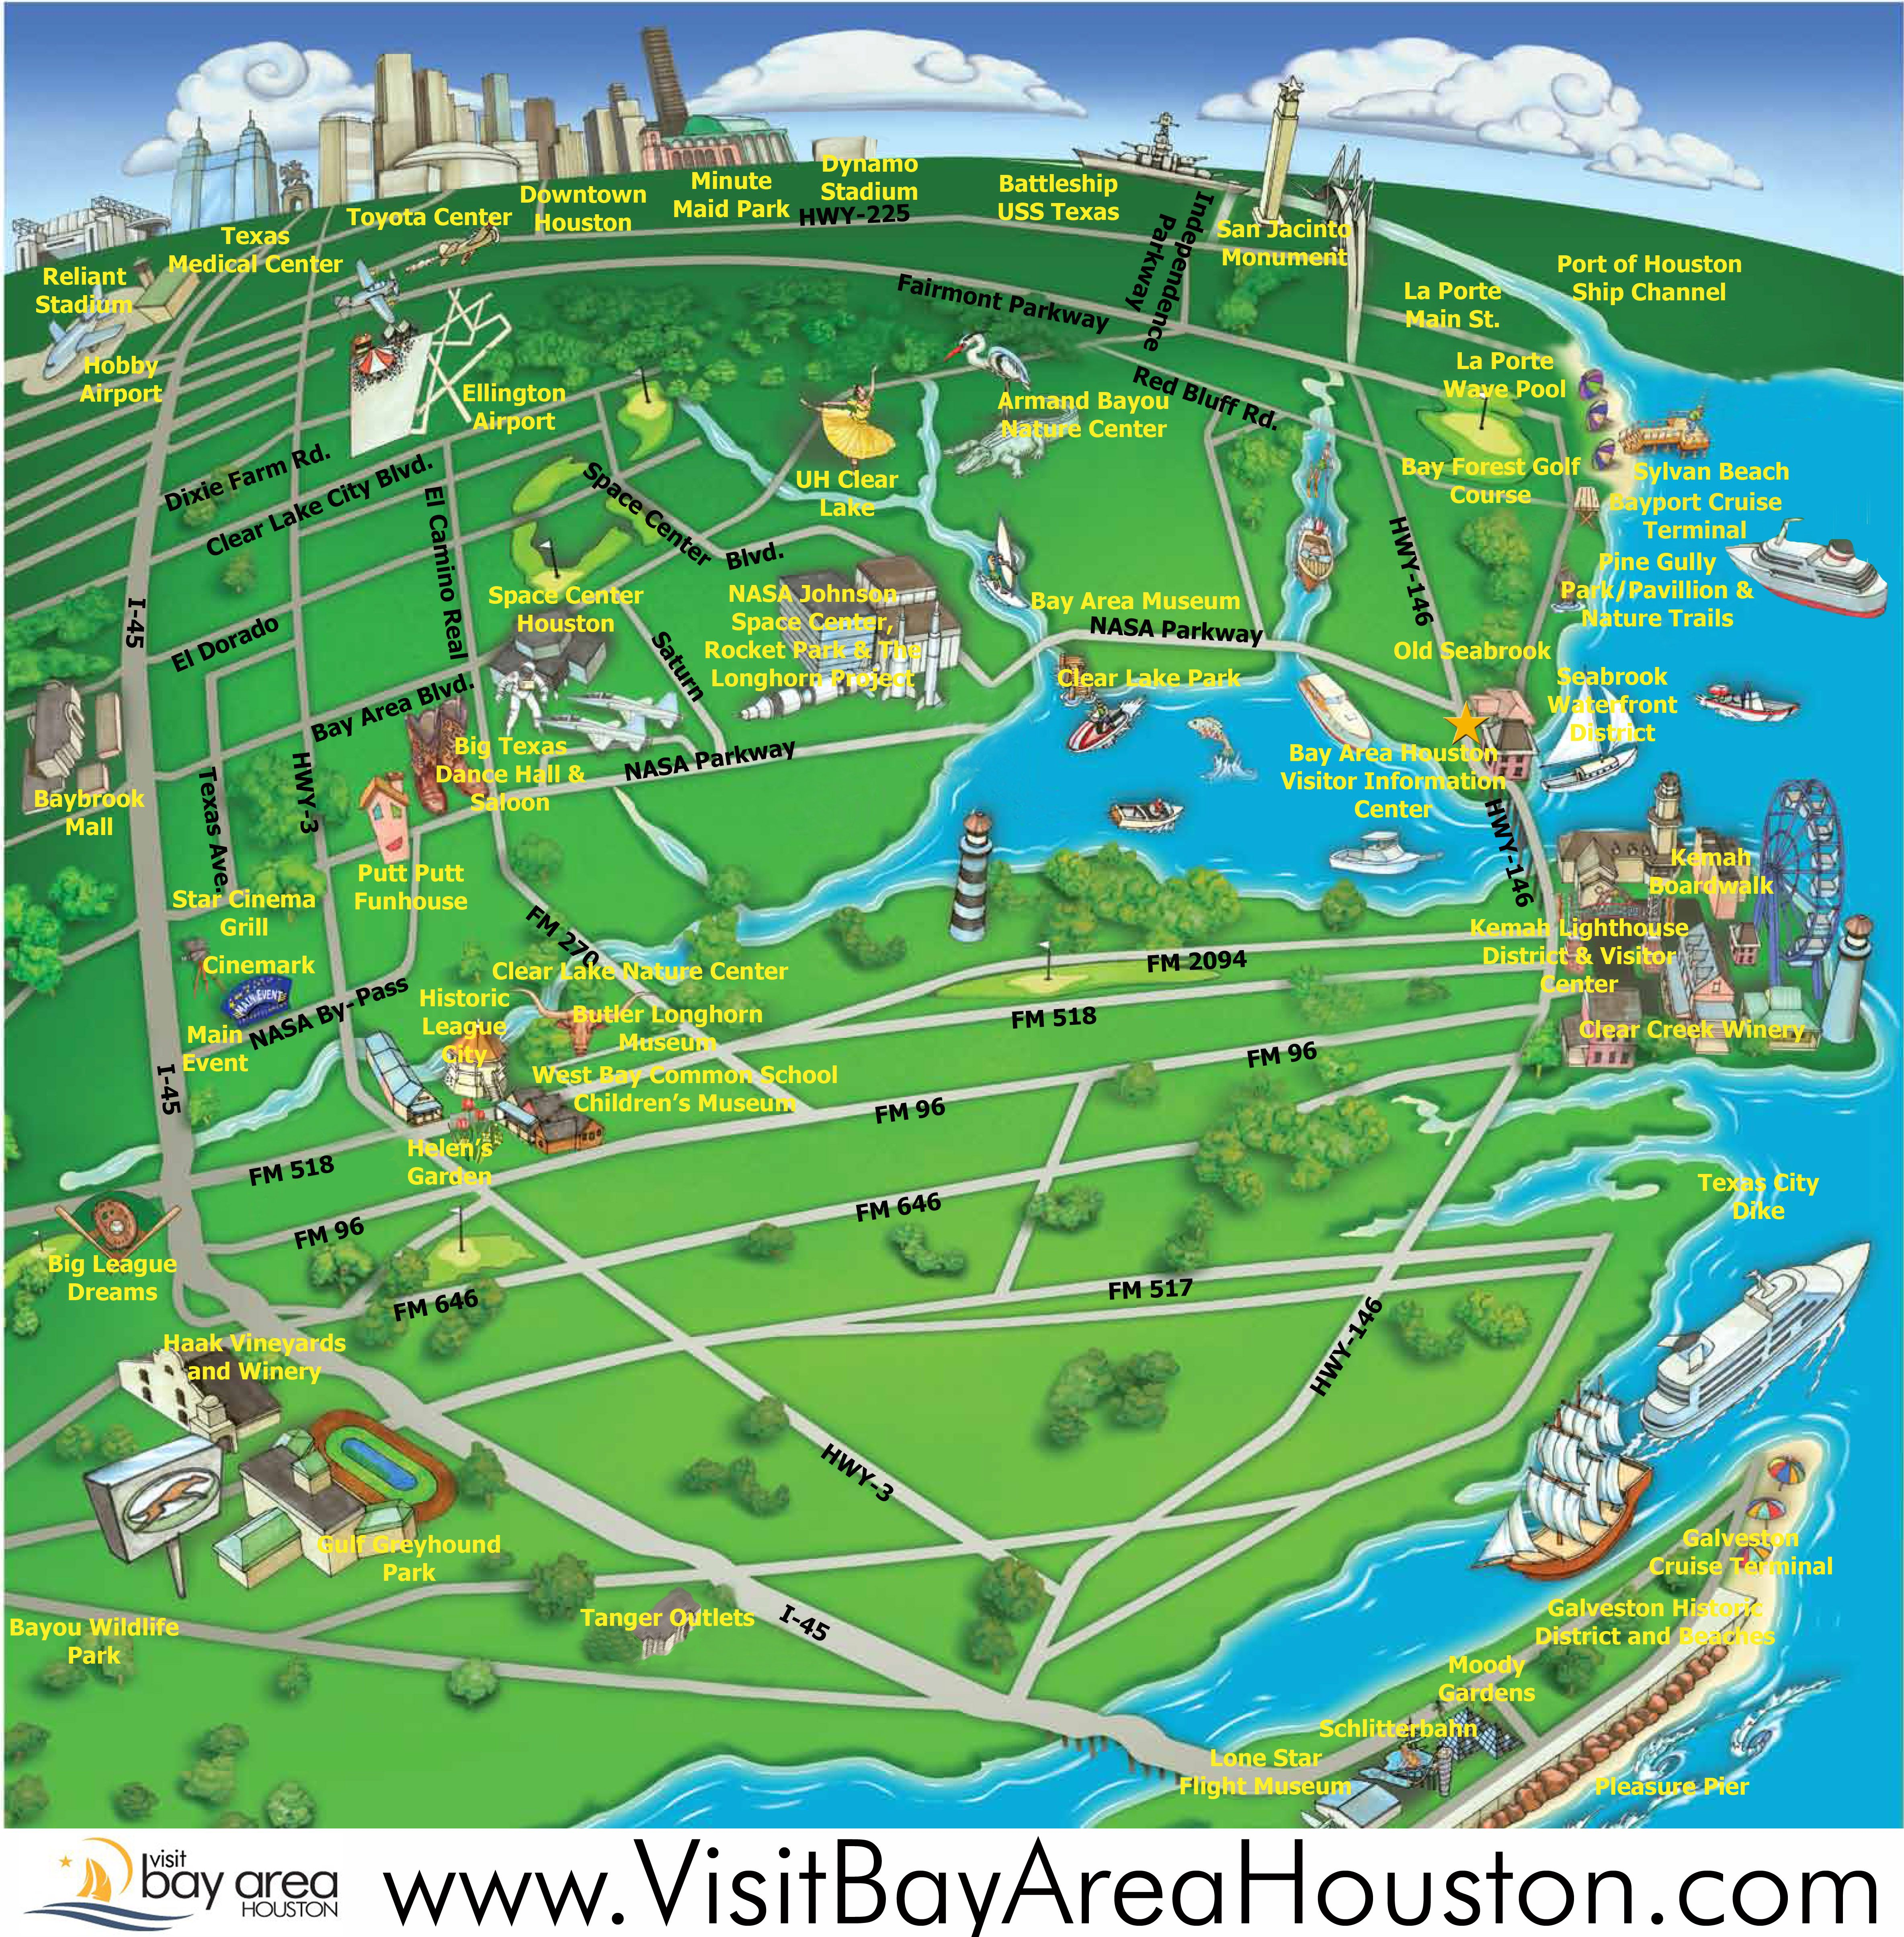 kemah seabrook map Map League City Galveston Bay Pinterest